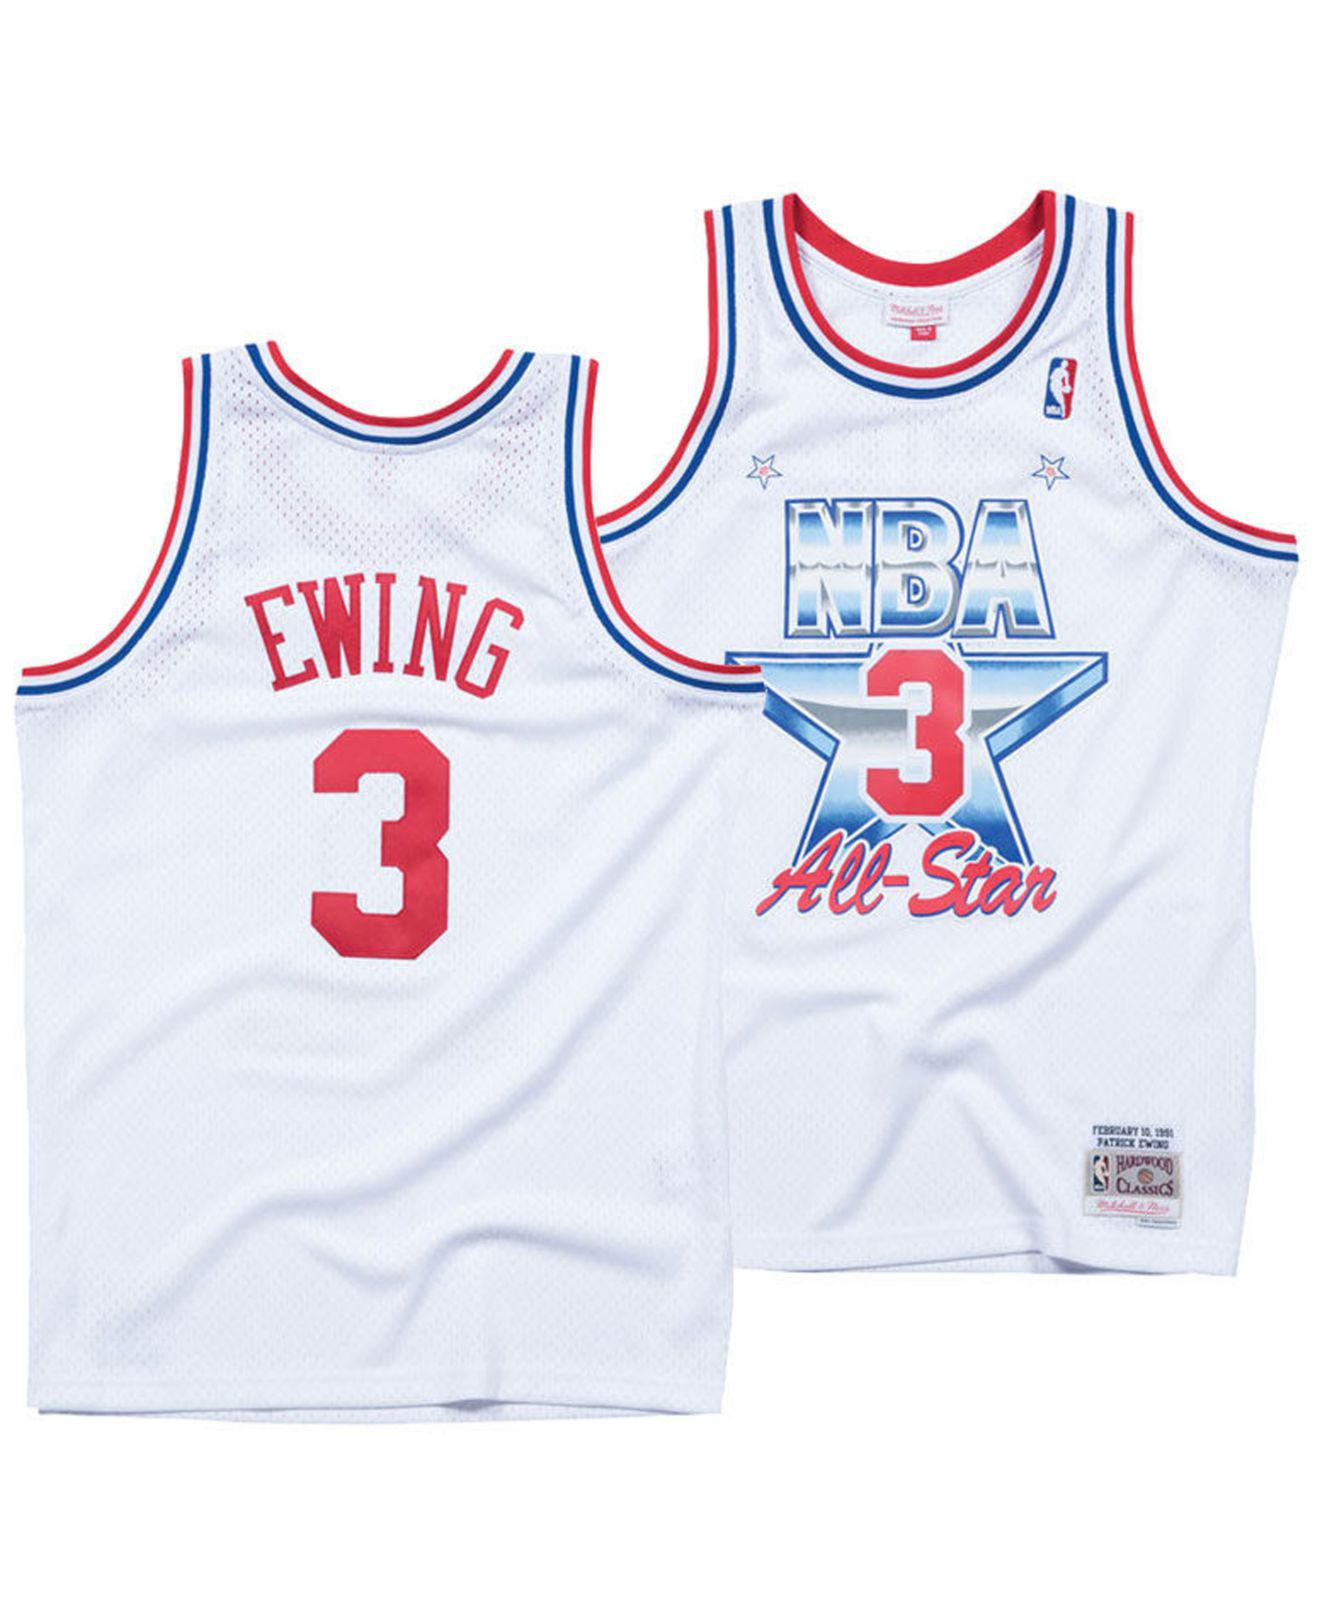 Lyst - Mitchell   Ness Patrick Ewing Nba All Star 1991 Swingman ... 77ea4e19b